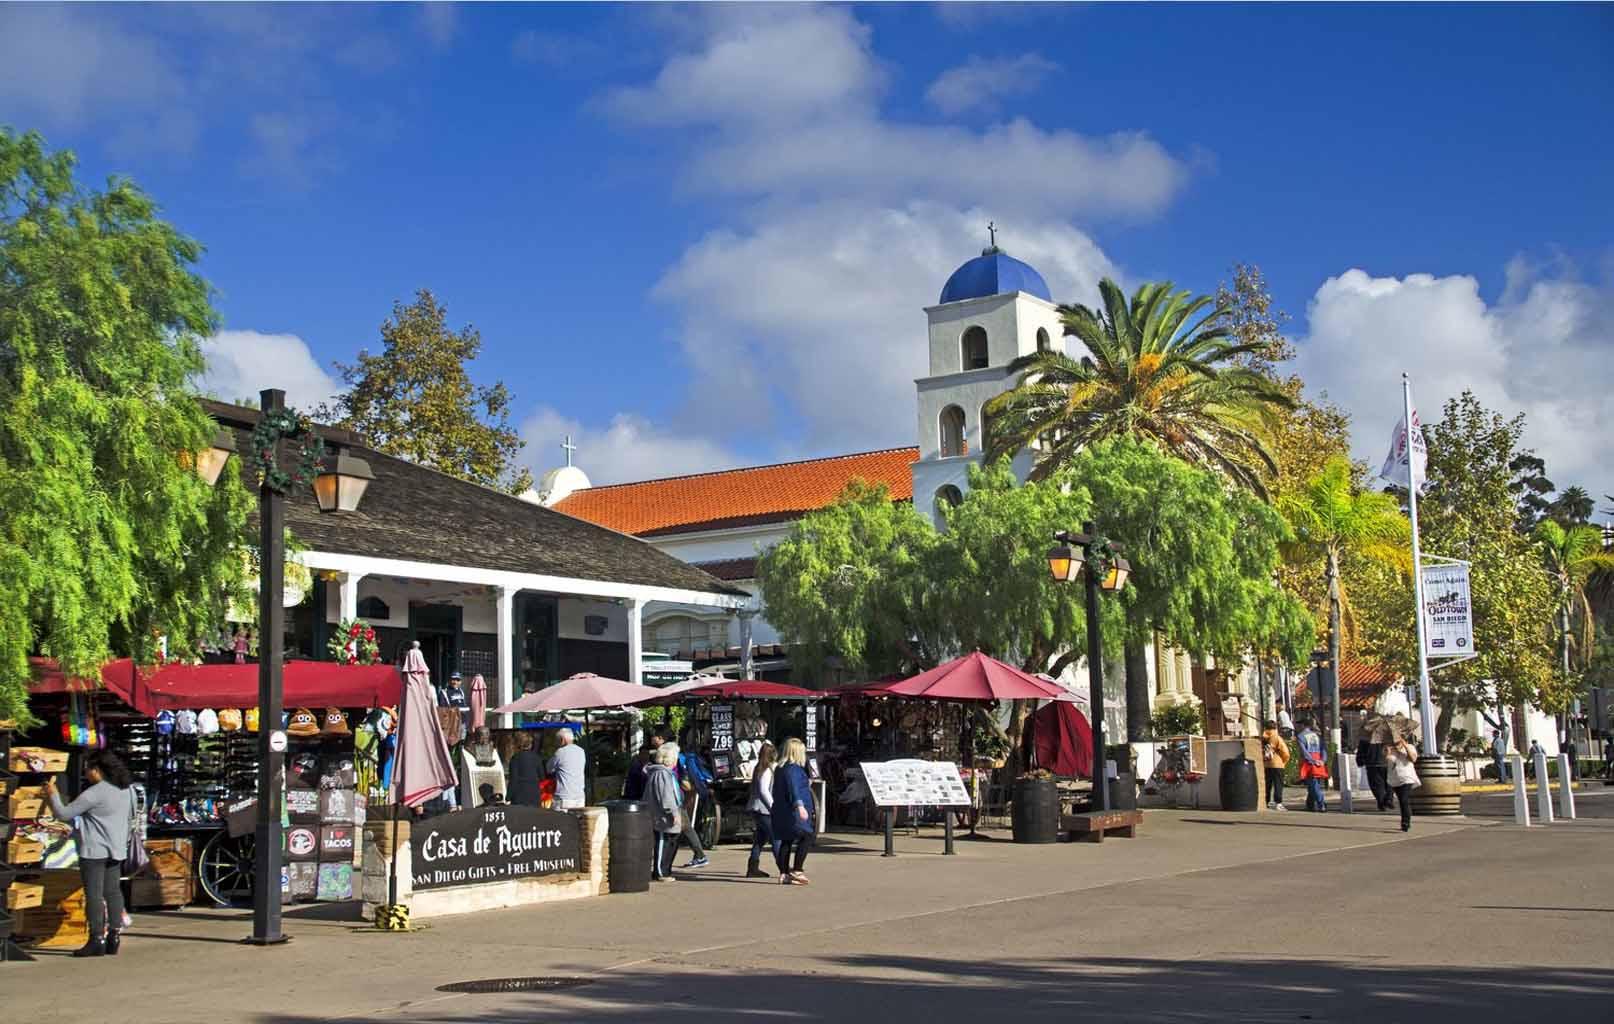 Phố cổ San Diego (Old Town San Diego Historic State Park)